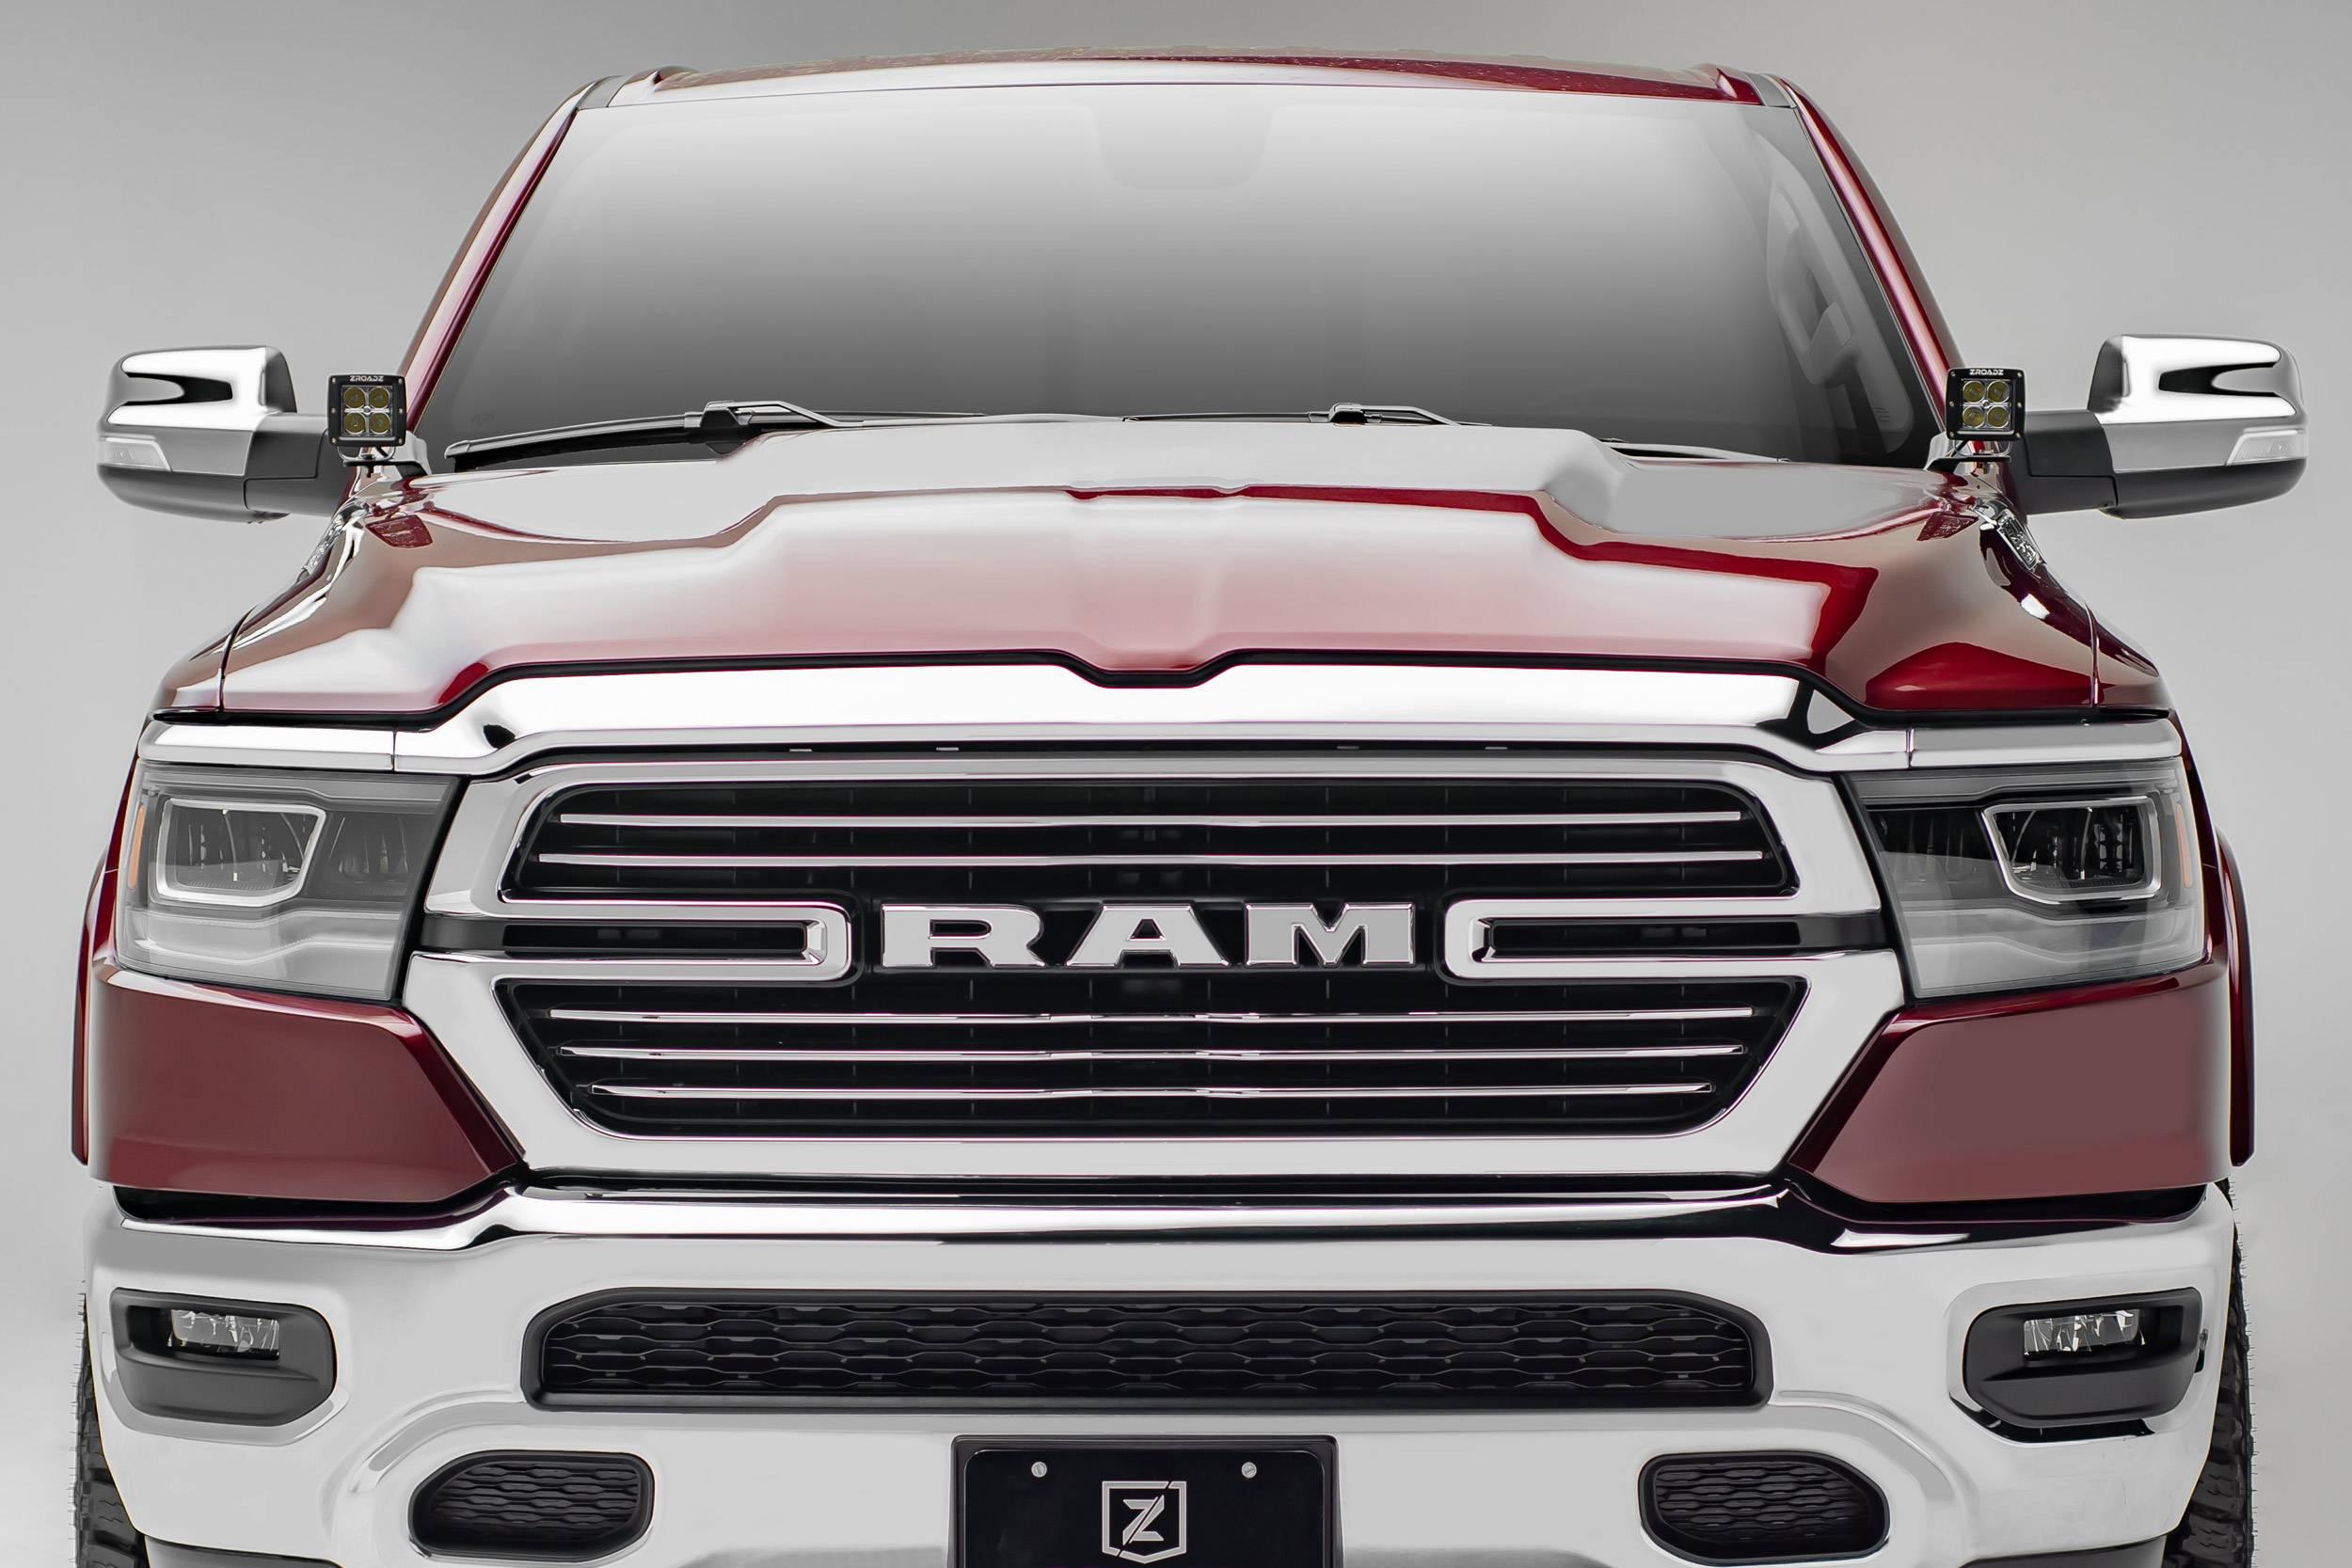 2019 Ram 1500 Hood Hinge LED Bracket to mount (2) 3 Inch LED Pod Lights - PN #Z364721